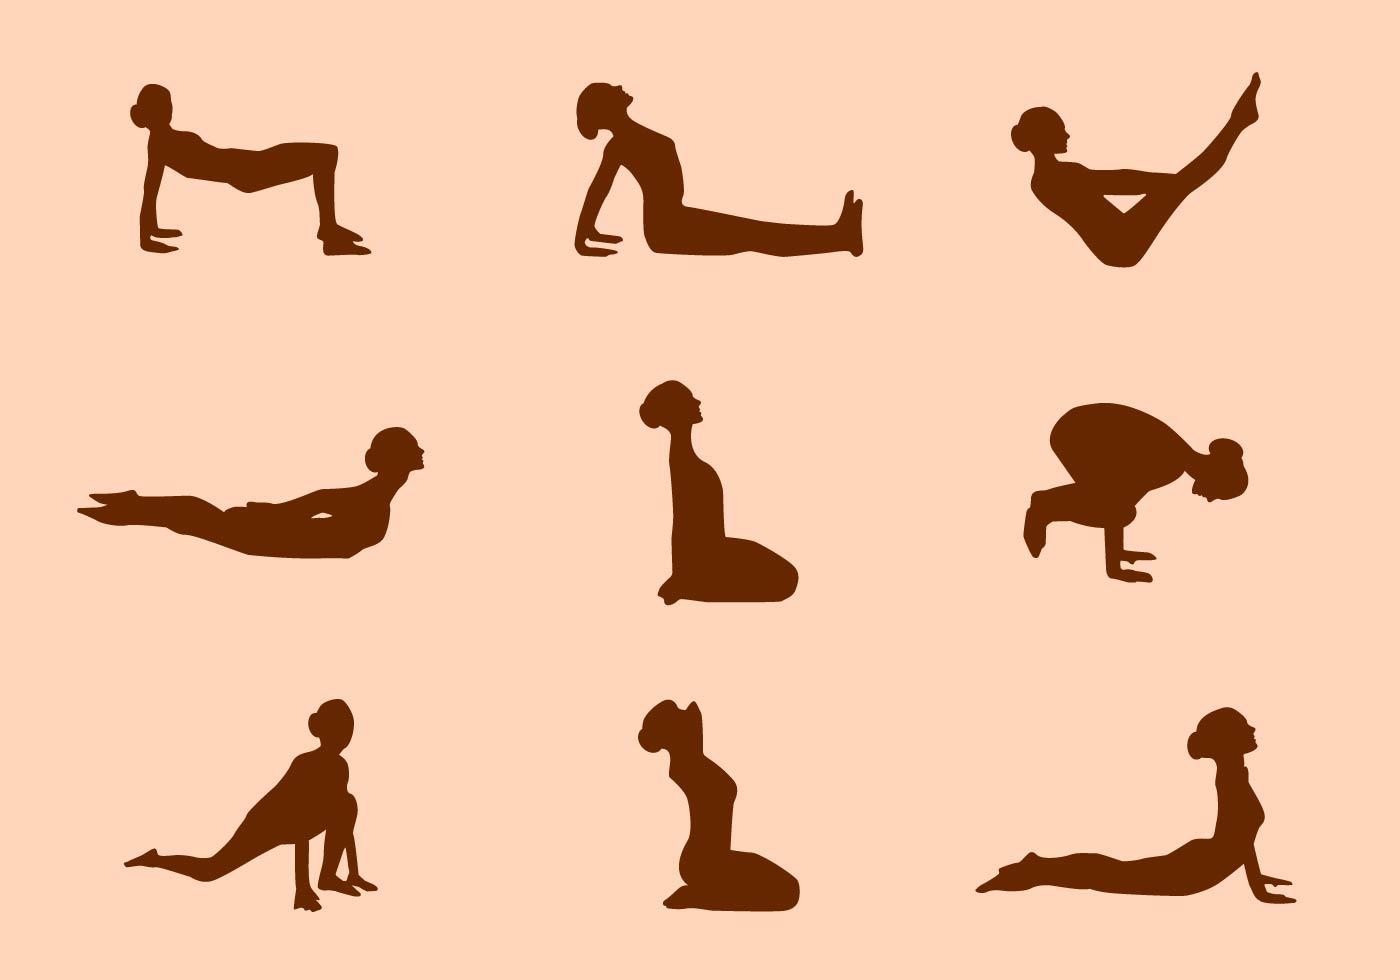 Silhouette of Yoga Pose Vectors - Download Free Vectors ...